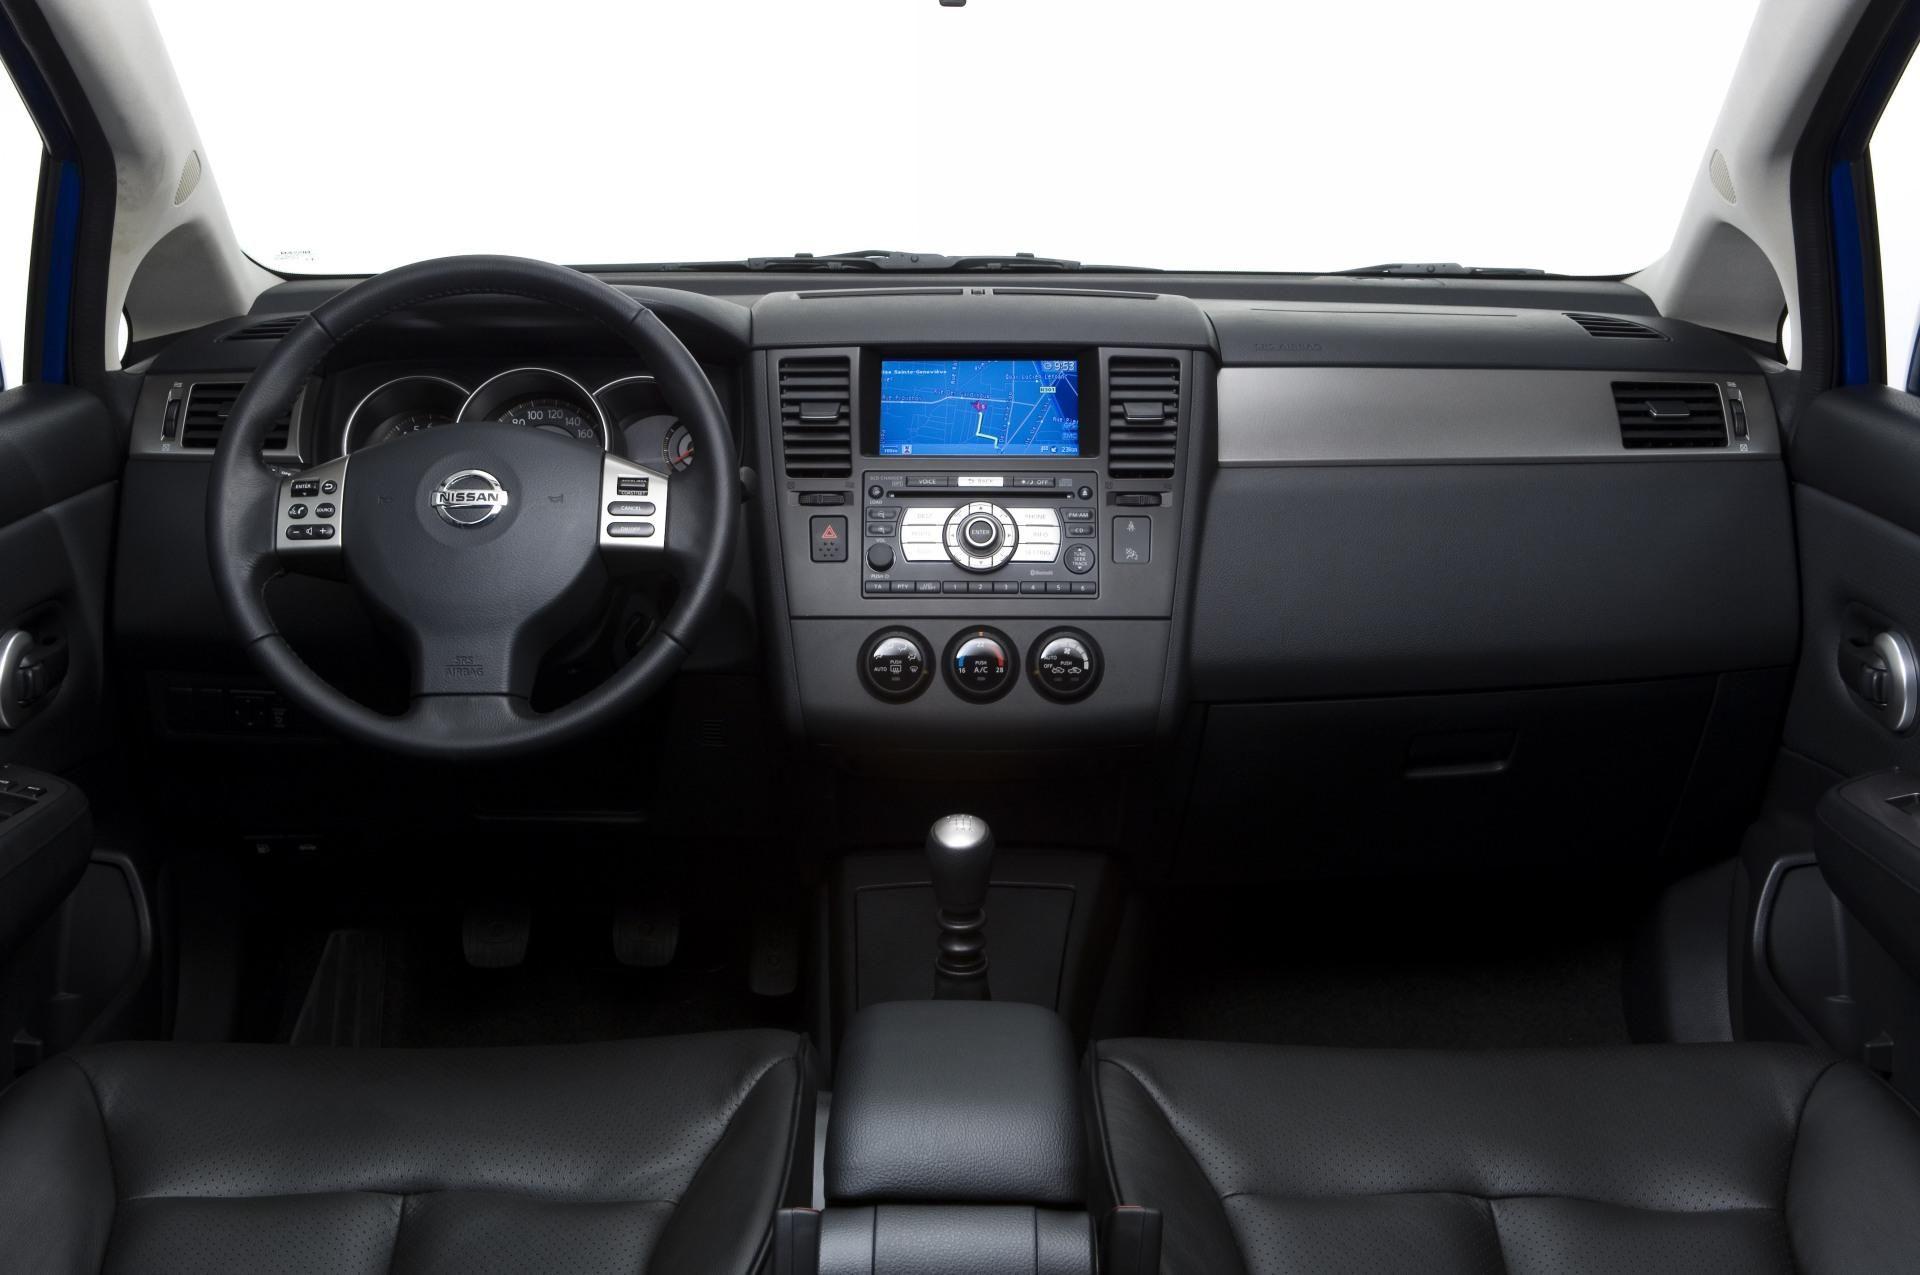 2008 Nissan Tiida Image Nissan, Vehiculos, Autos